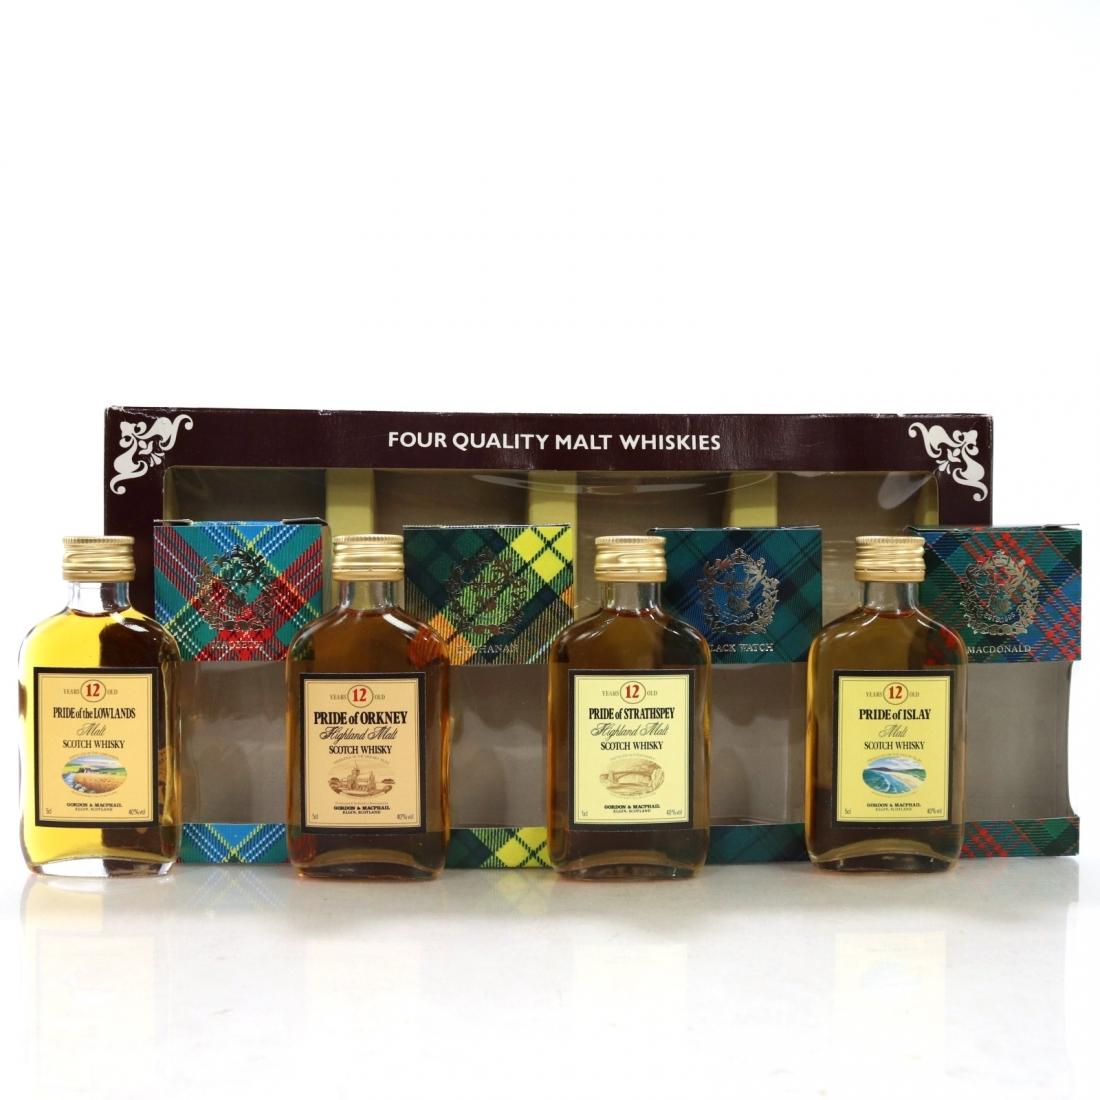 Pride of Regions Scotch Miniatures / Gordon and MacPhail